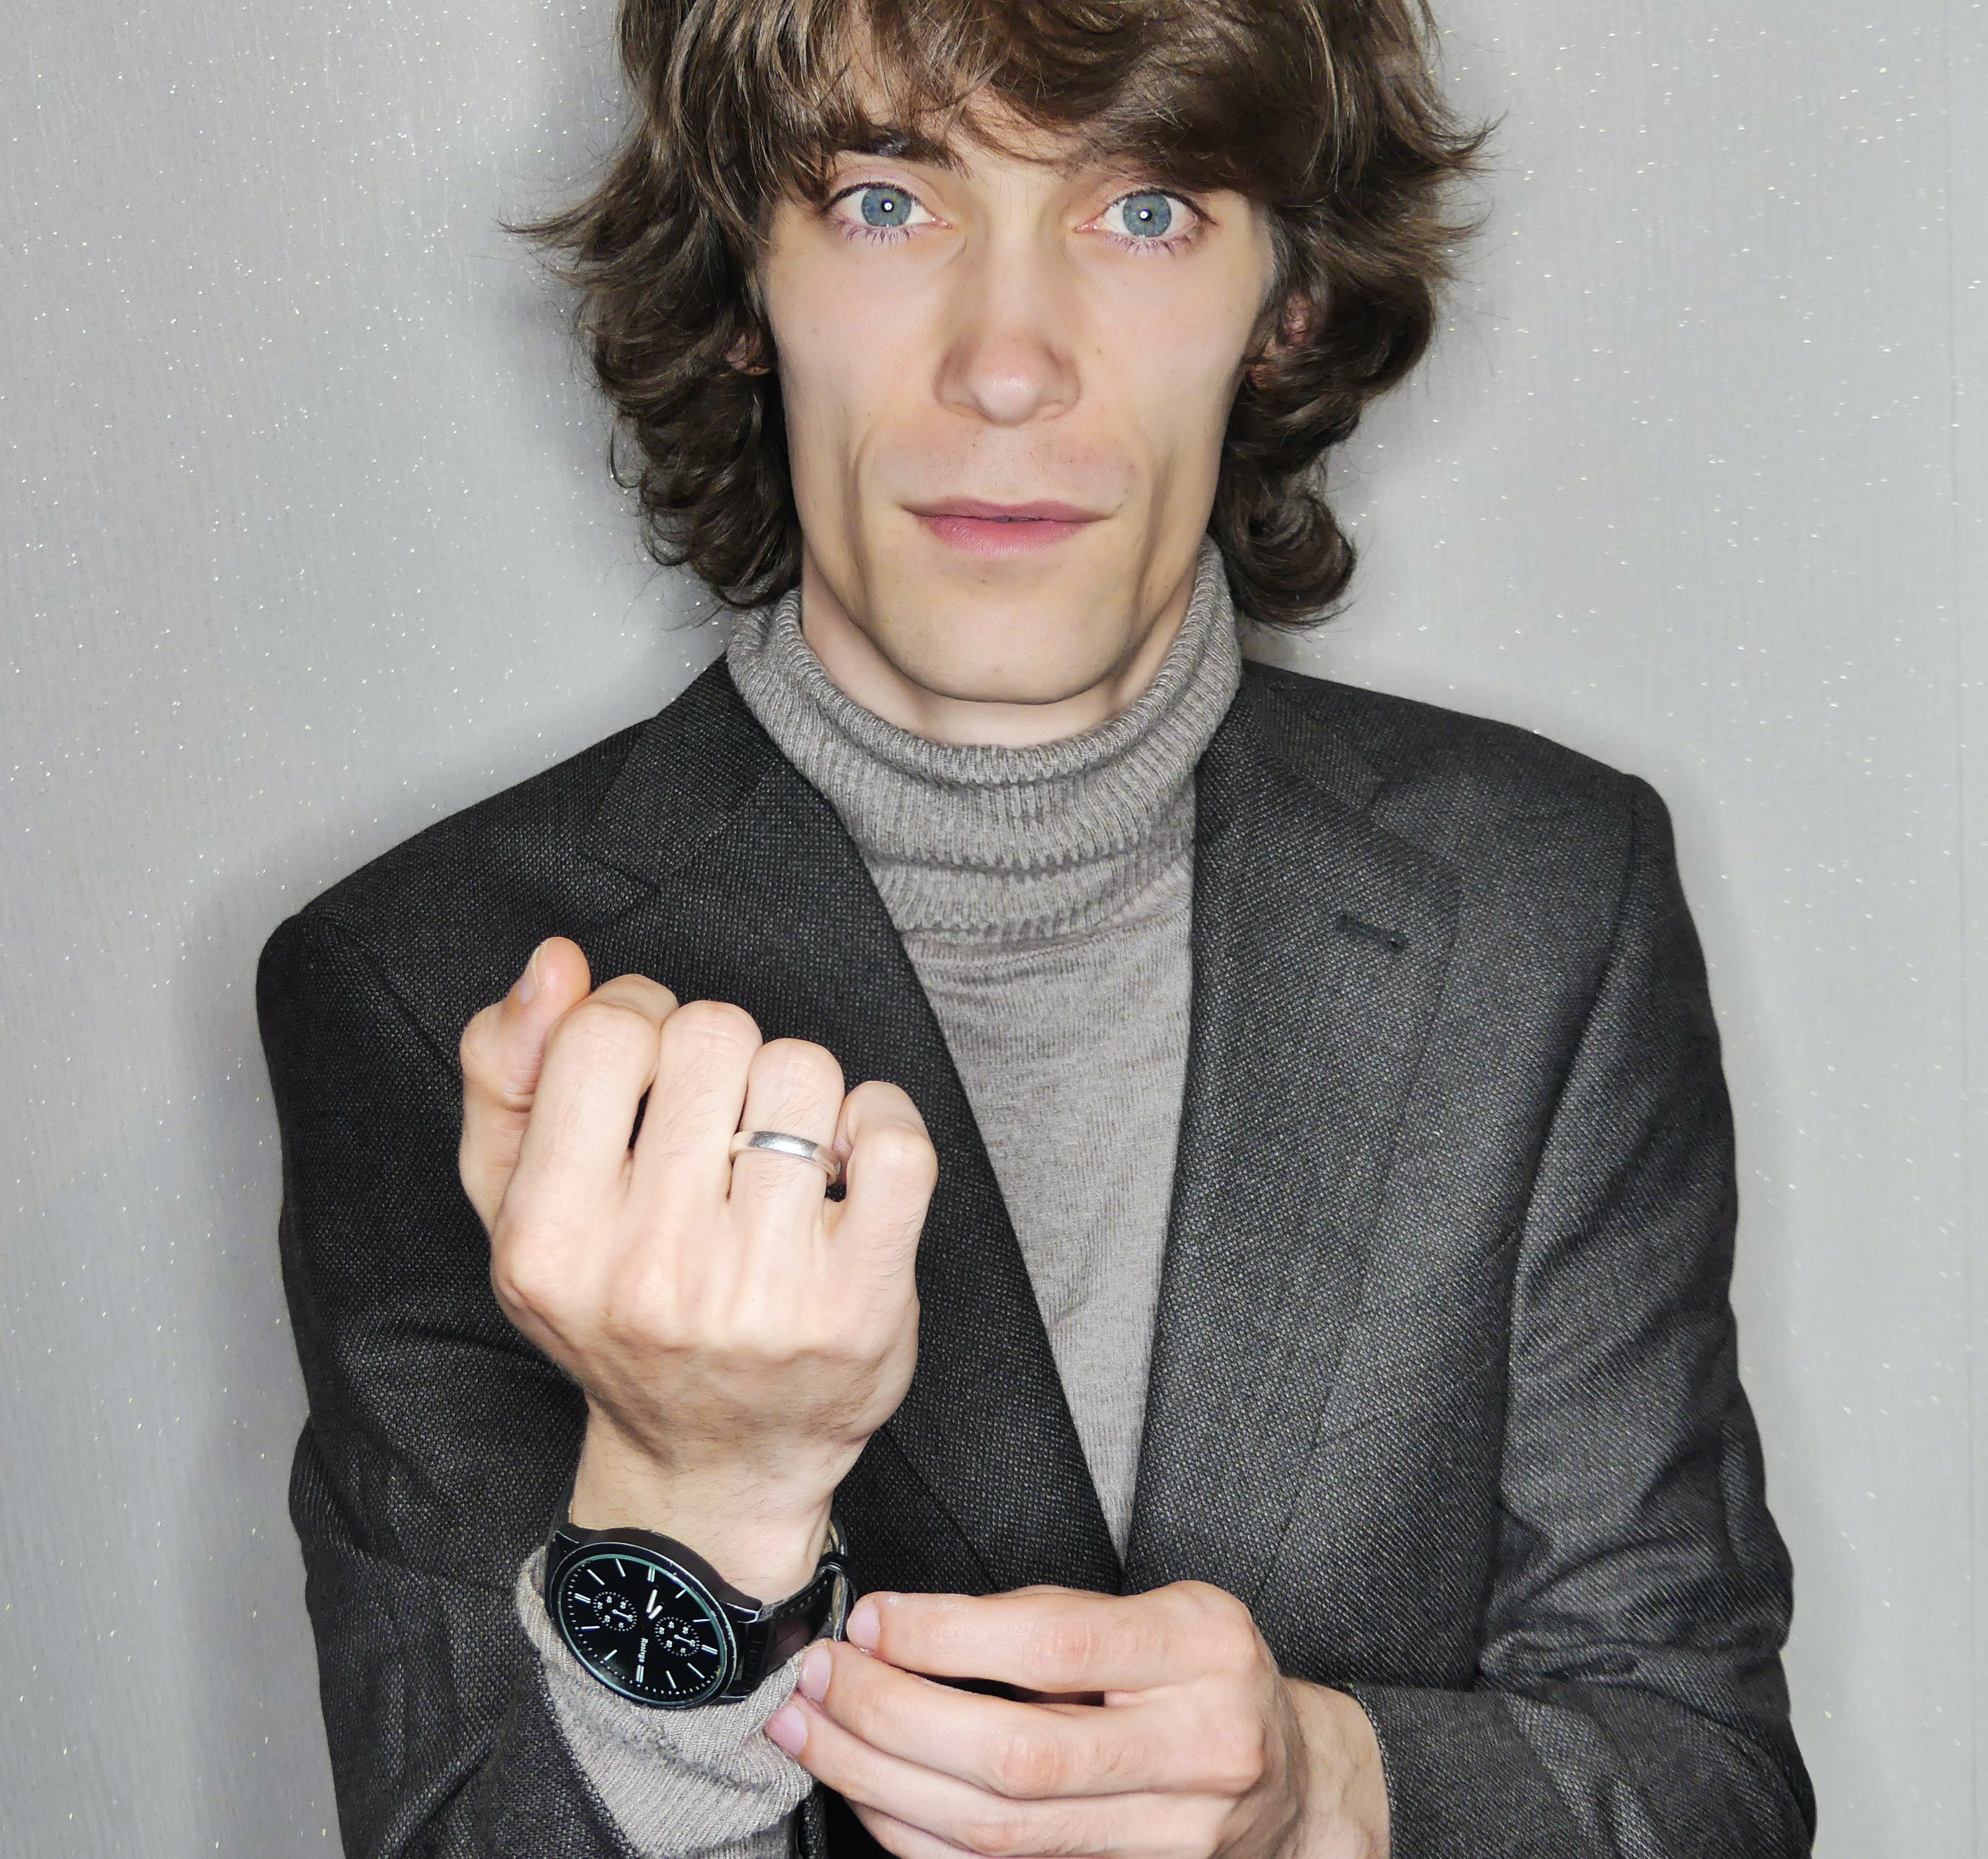 Portrait of Man Wearing Gray Suit Jacket.